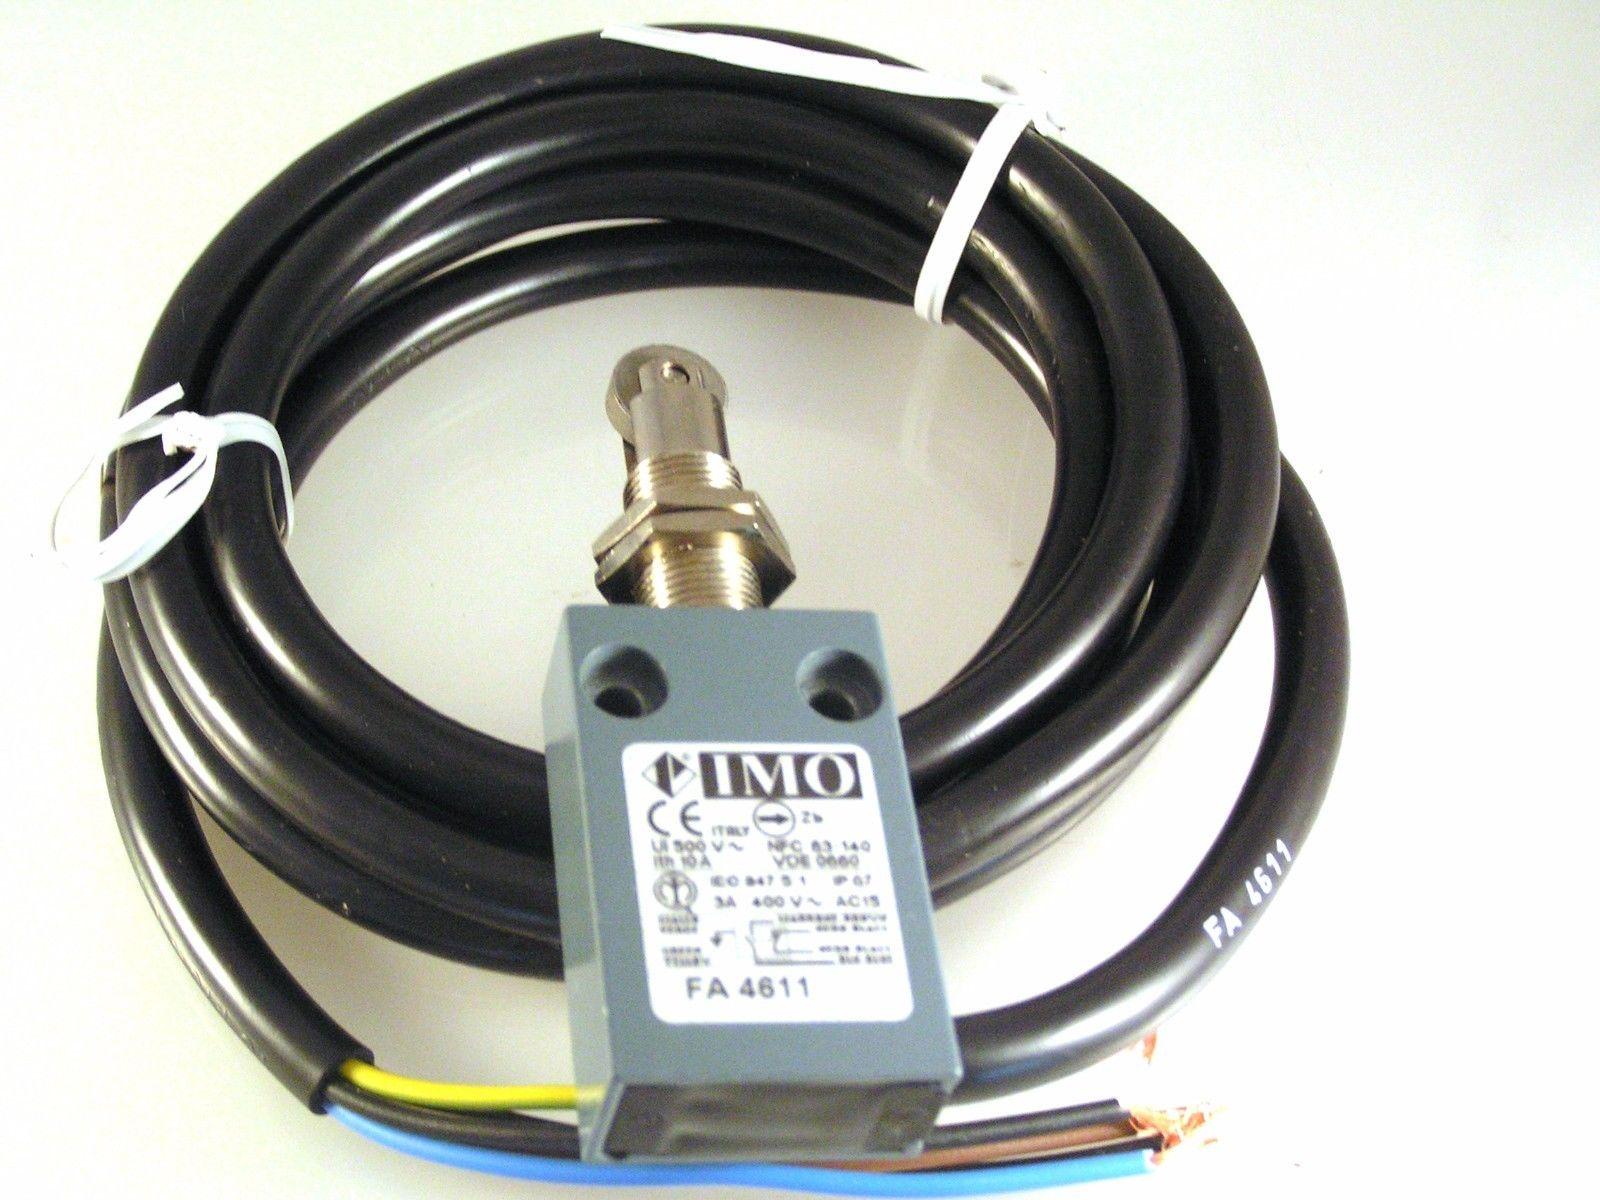 IMO FA4611 3A 400V Mini Precabled Limit Switch 1 NO and 1 NC Contact MBC003b